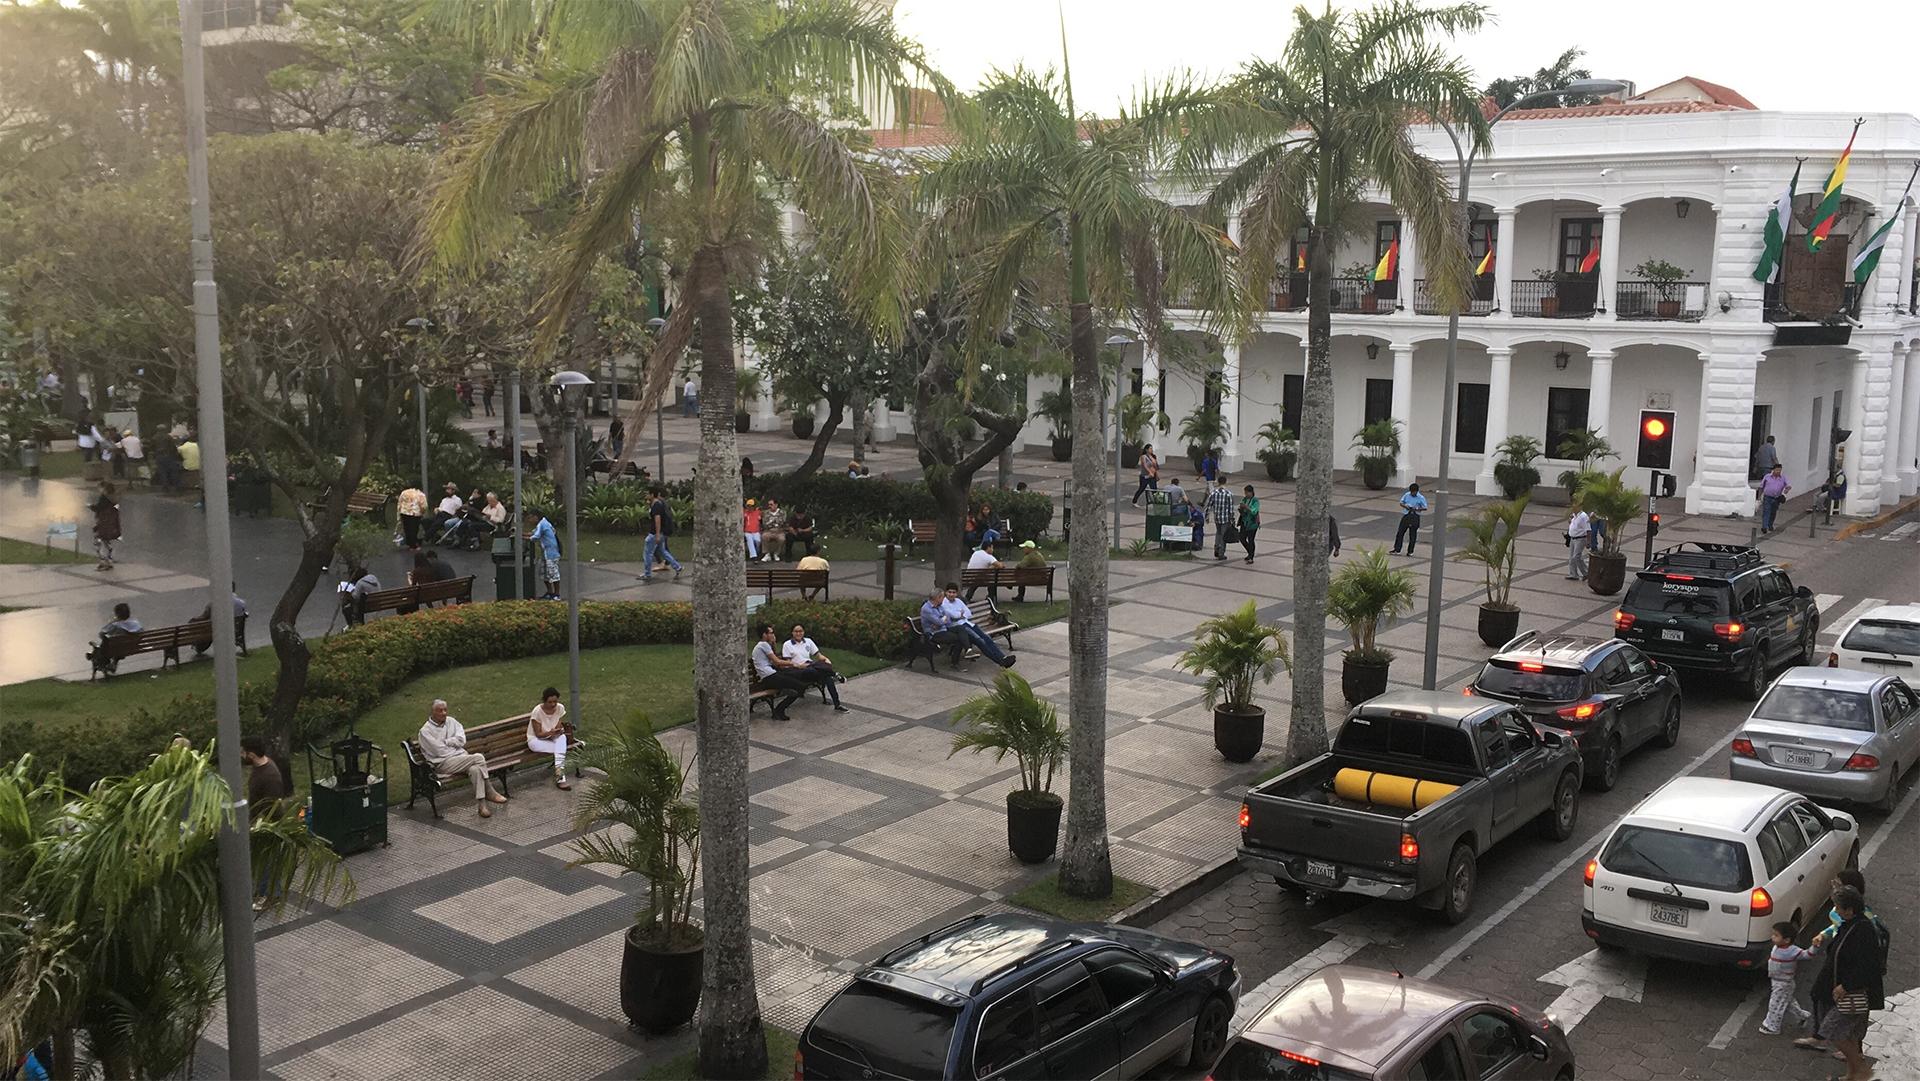 plaza santa cruz bolivia pablocaminante 1 - Ruta del Che, Samaipata